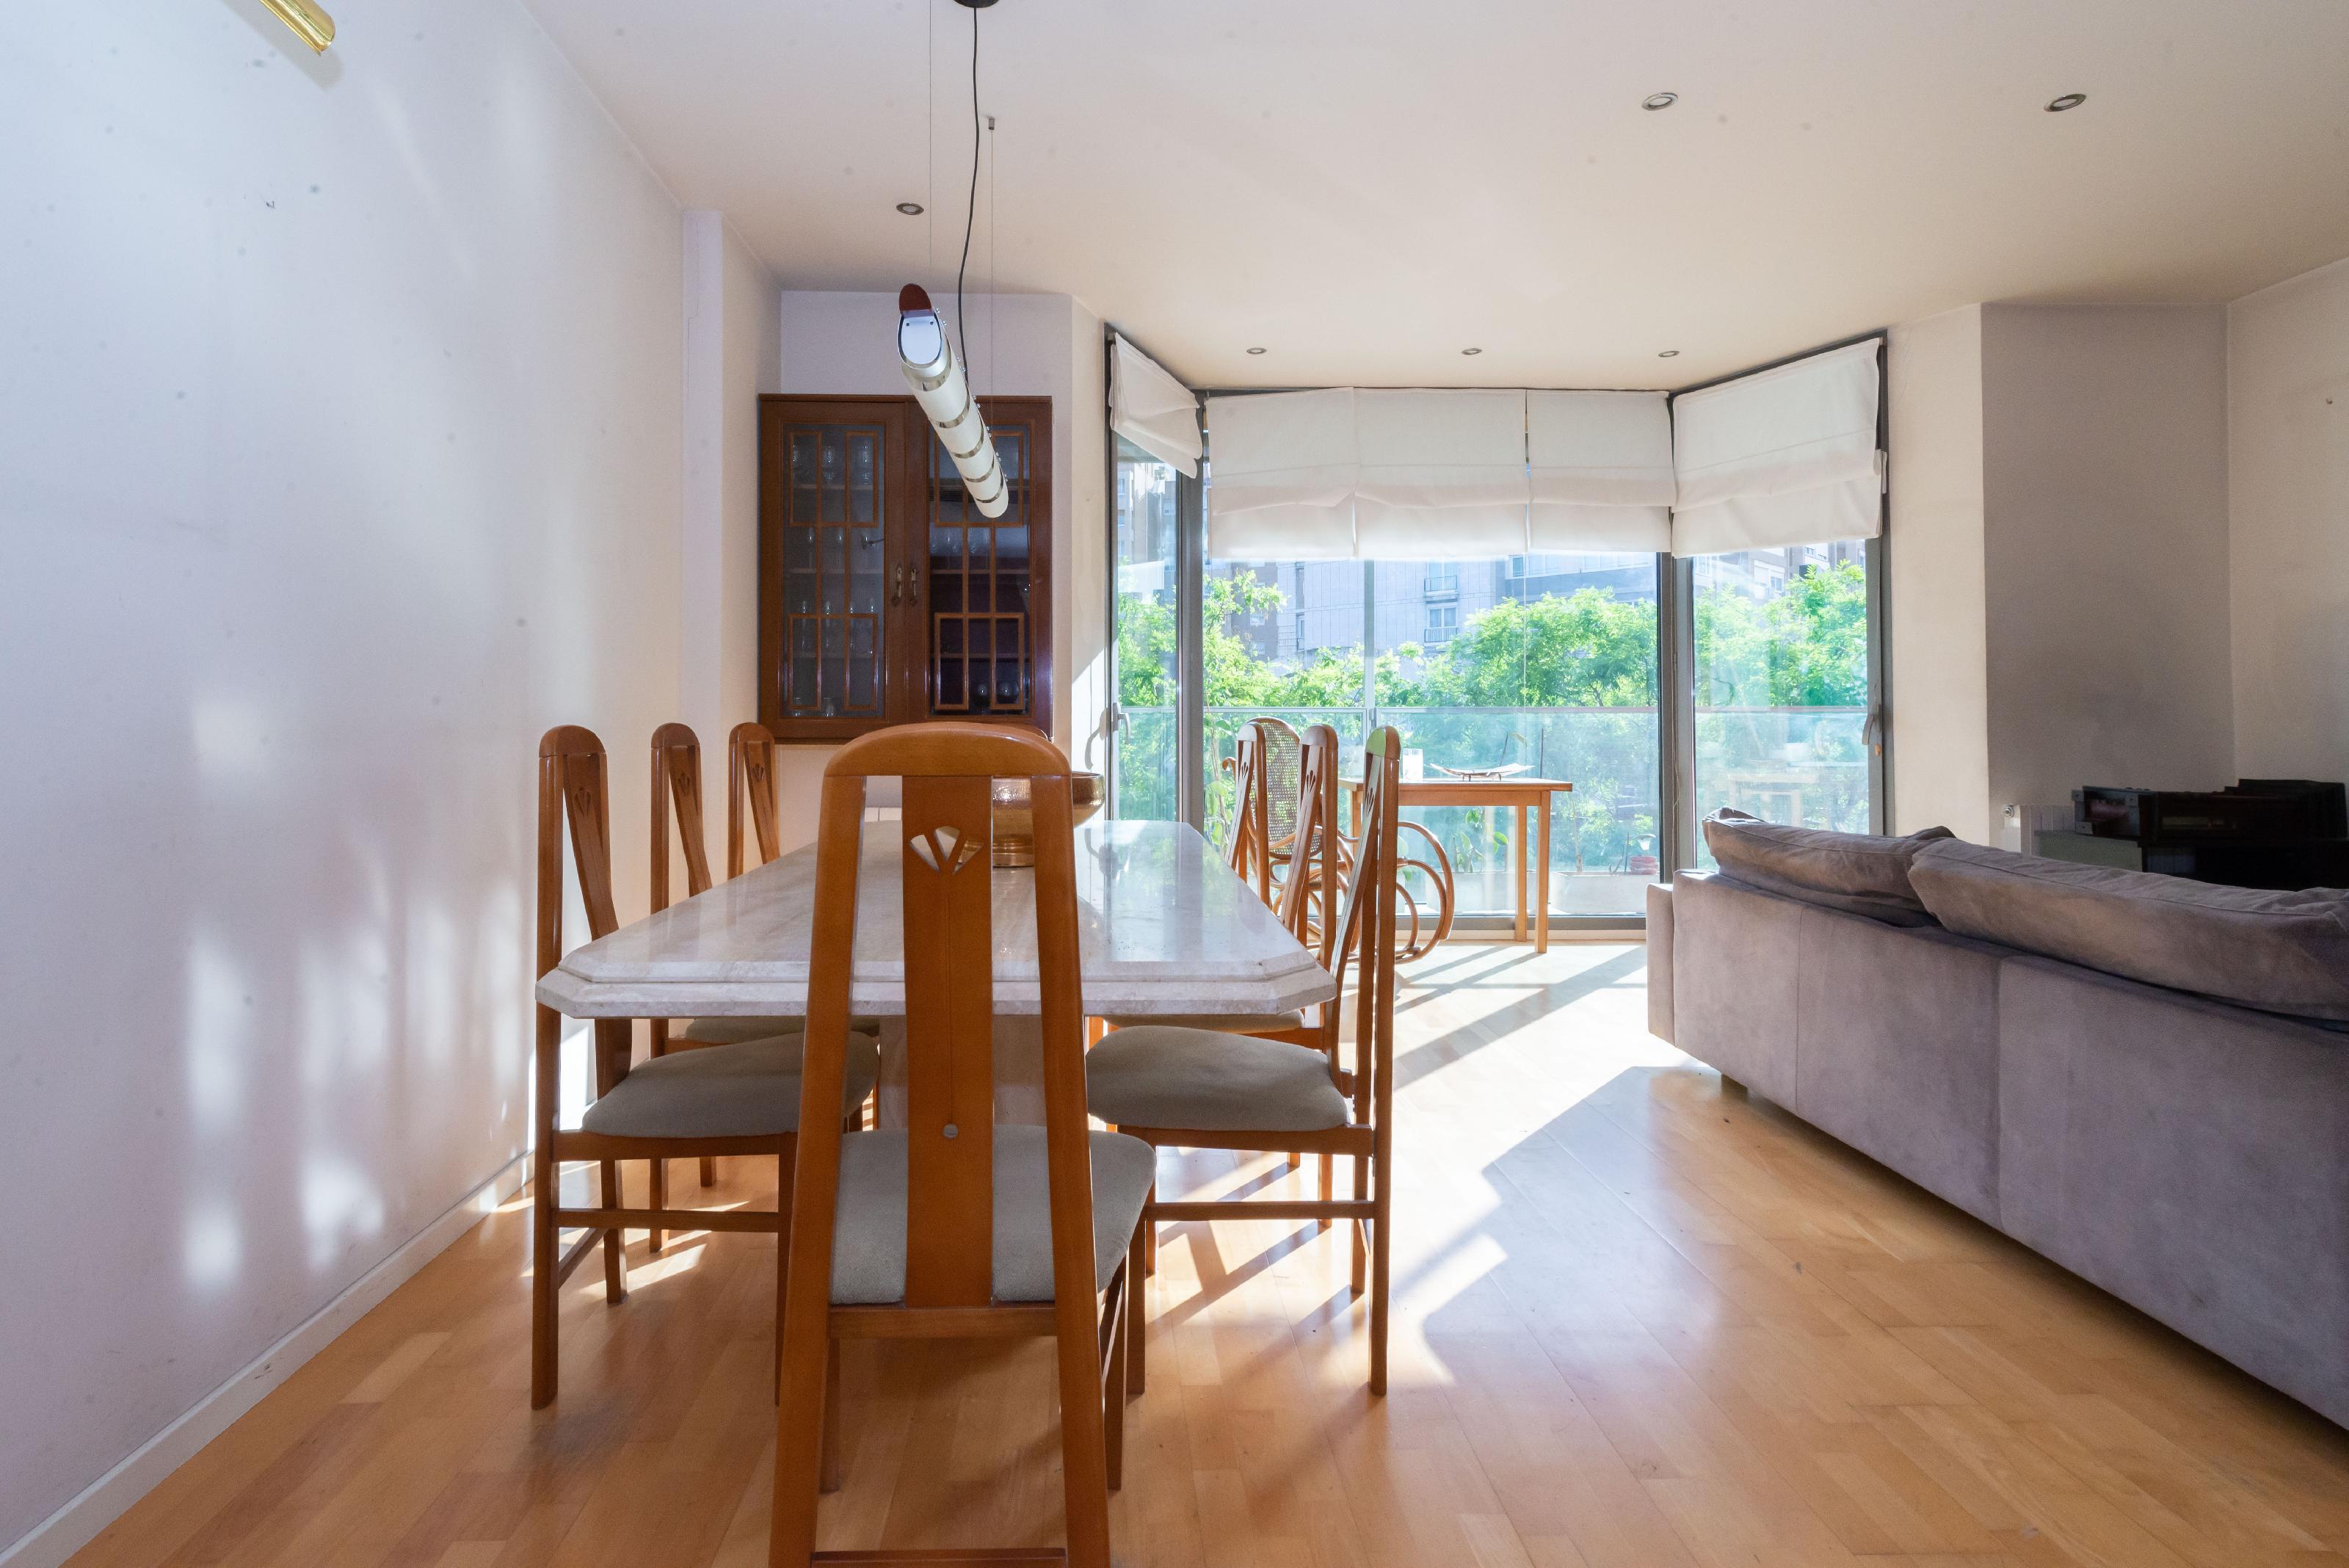 246281 Flat for sale in Sarrià-Sant Gervasi, Tres Torres 11